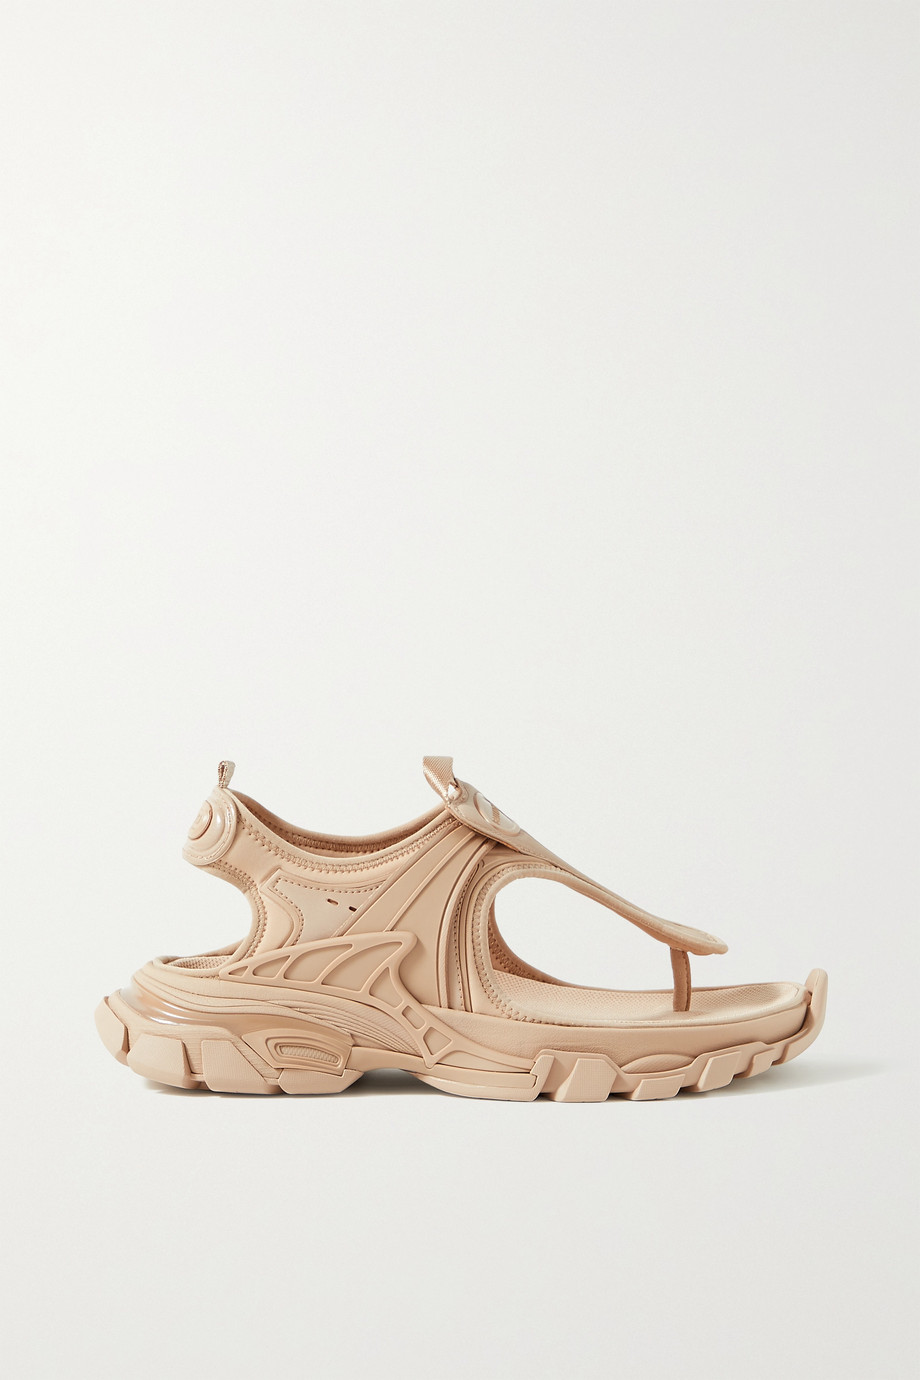 Balenciaga Track logo-detailed rubber and neoprene sandals